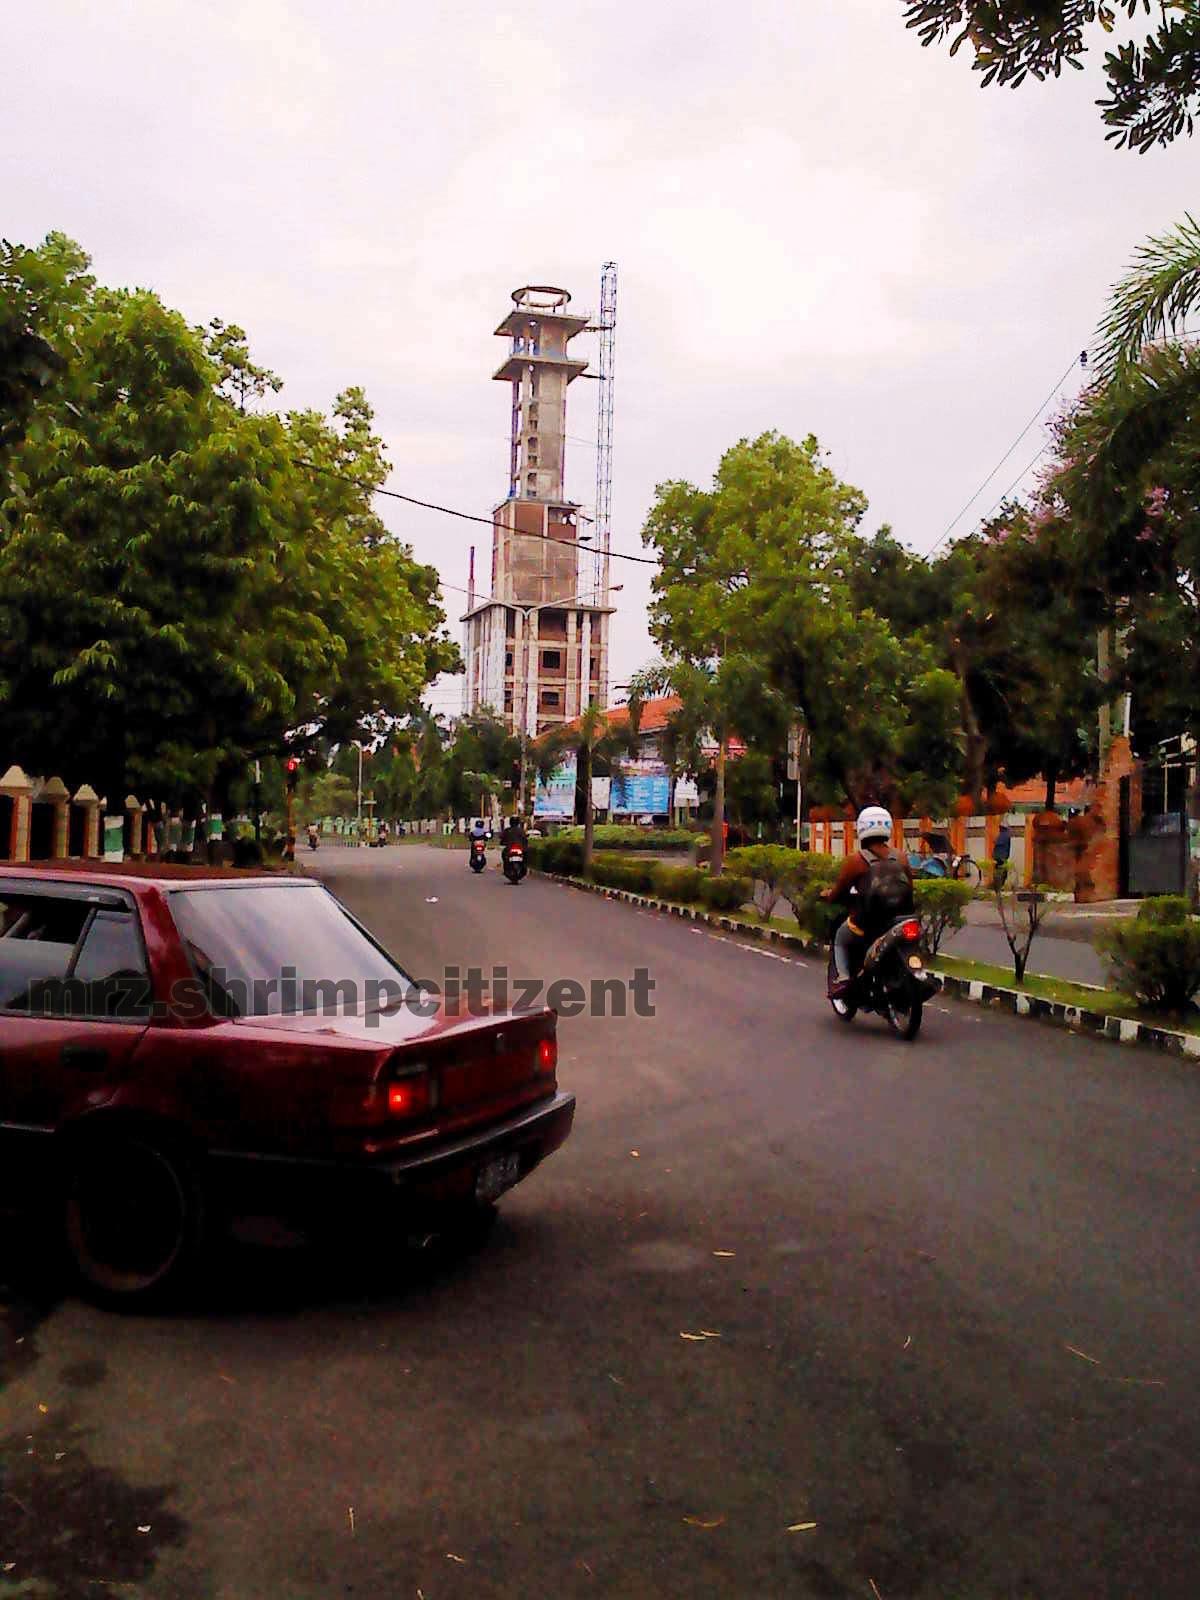 Pembangunan Menara Masjid Agung Sumber, Kab. Cirebon 5